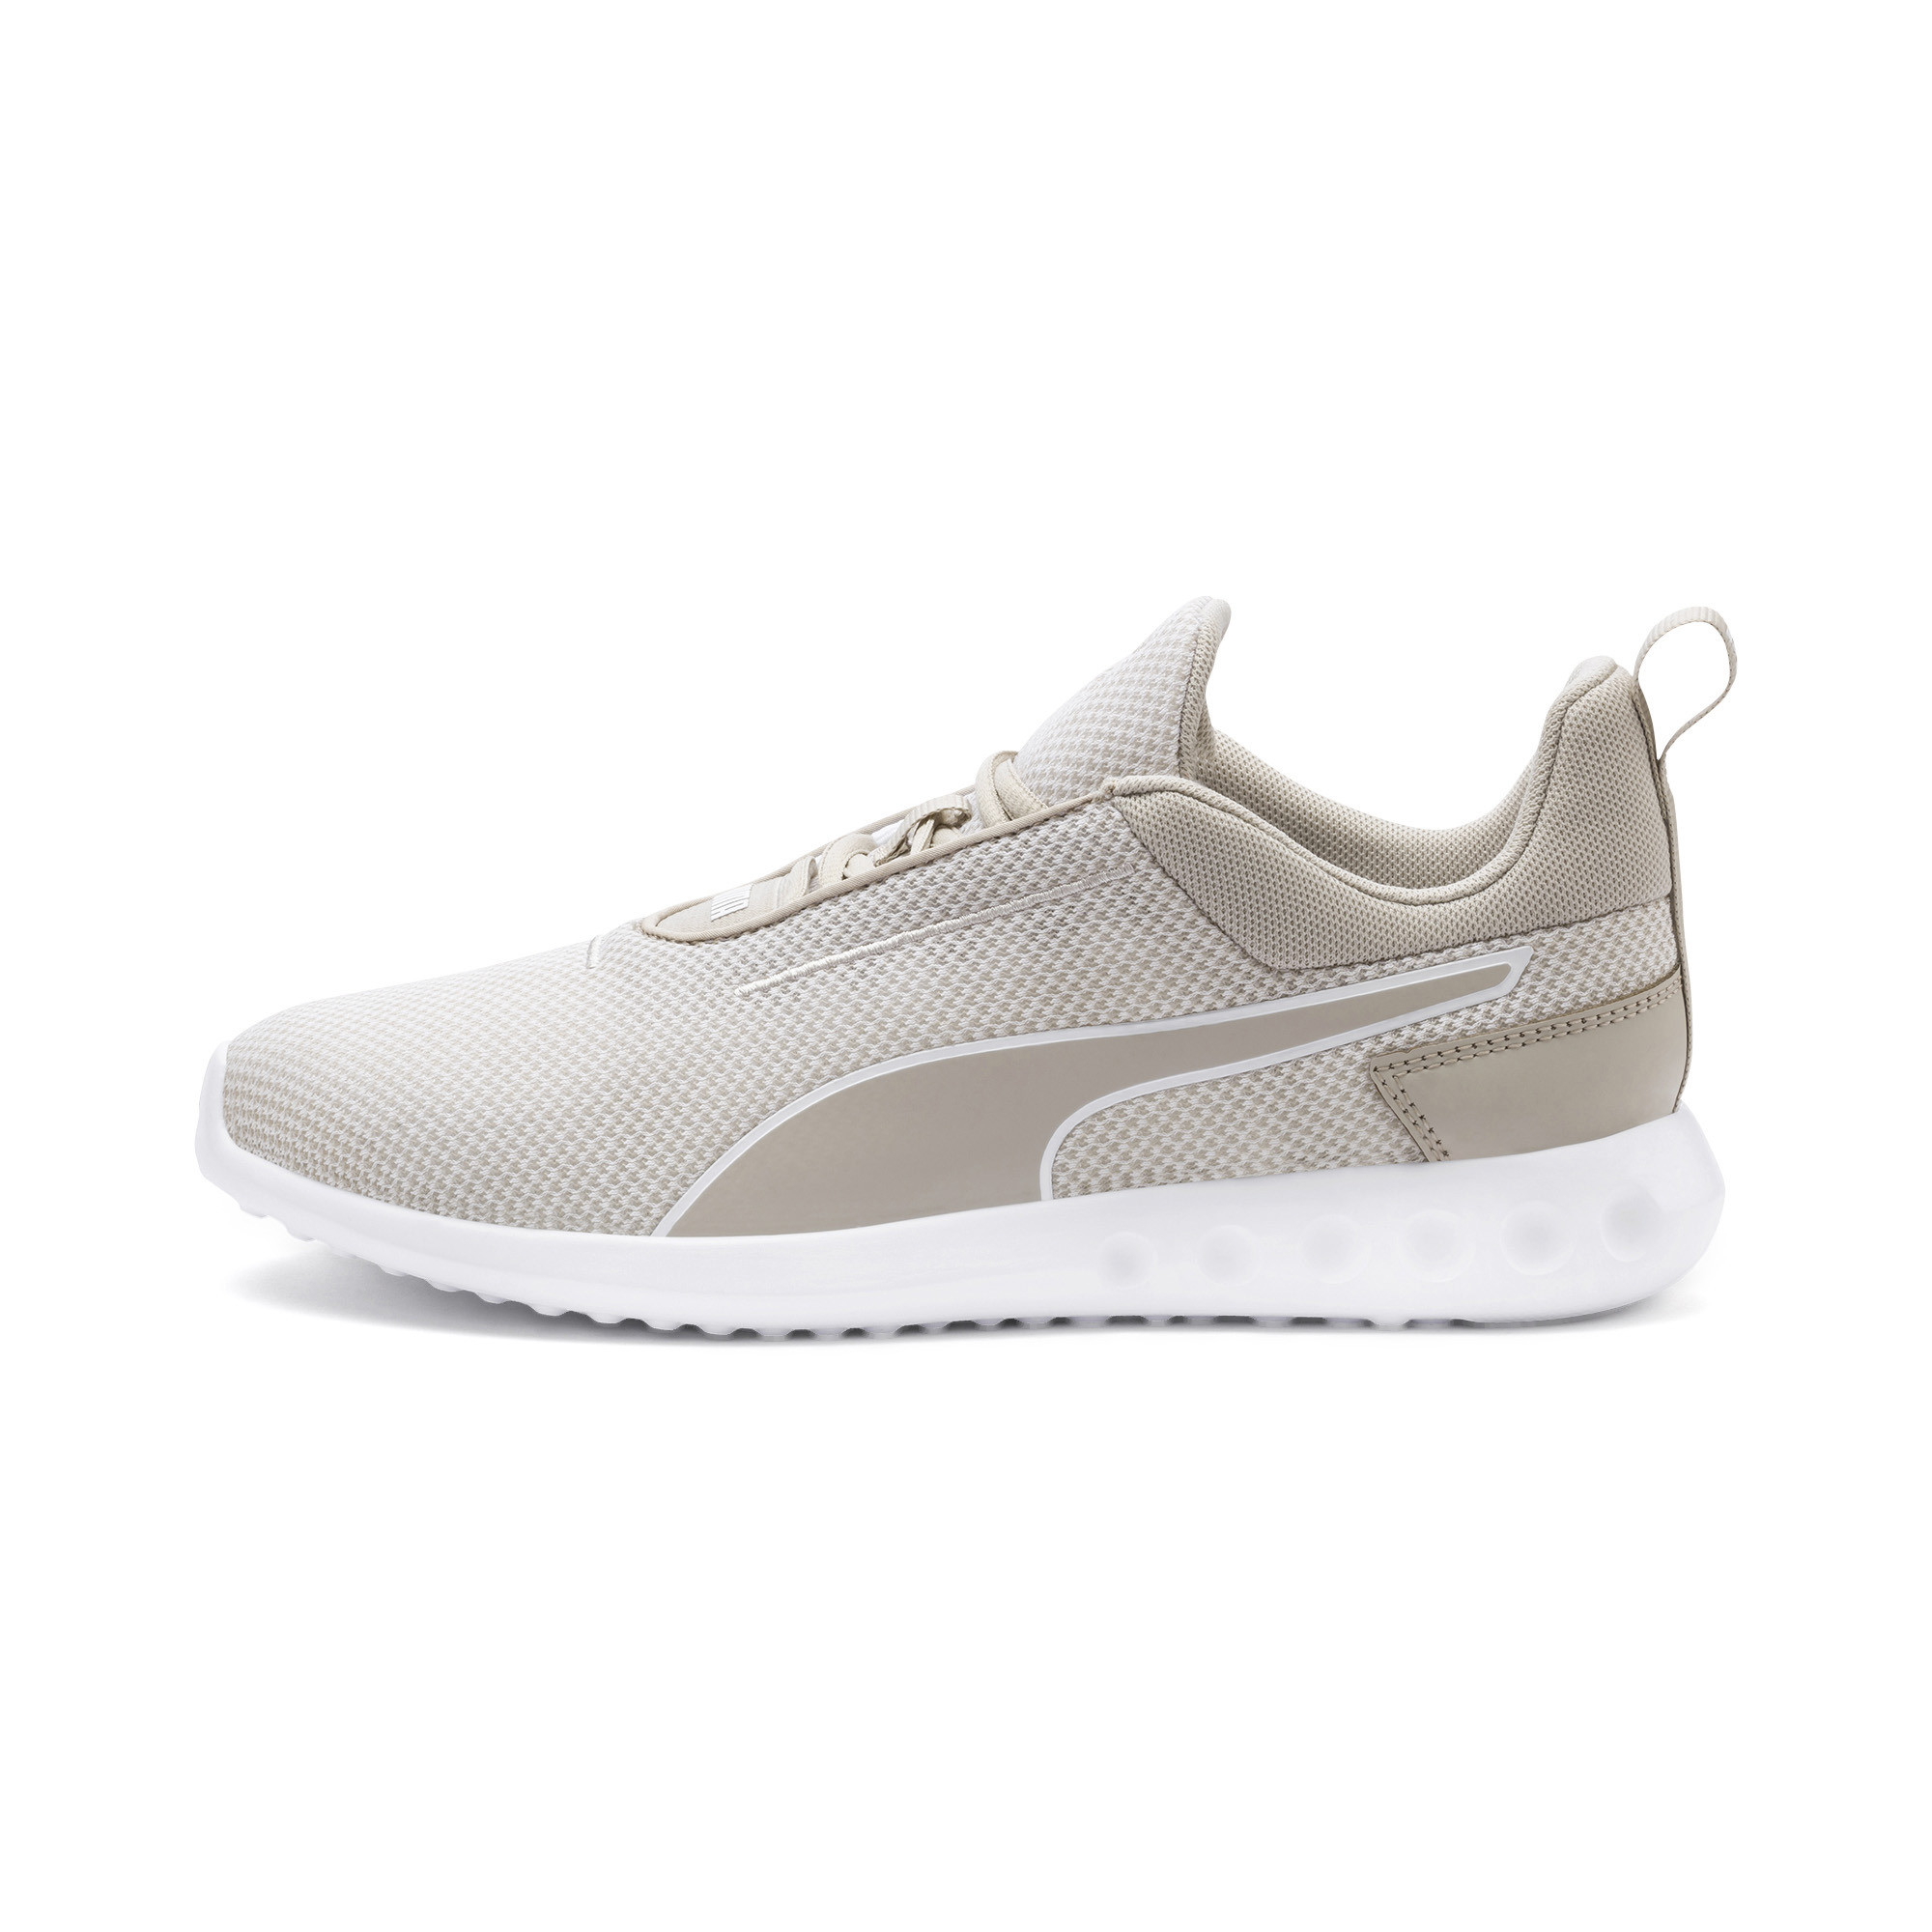 PUMA-Carson-2-Concave-Women-s-Training-Shoes-Women-Shoe-Running thumbnail 4